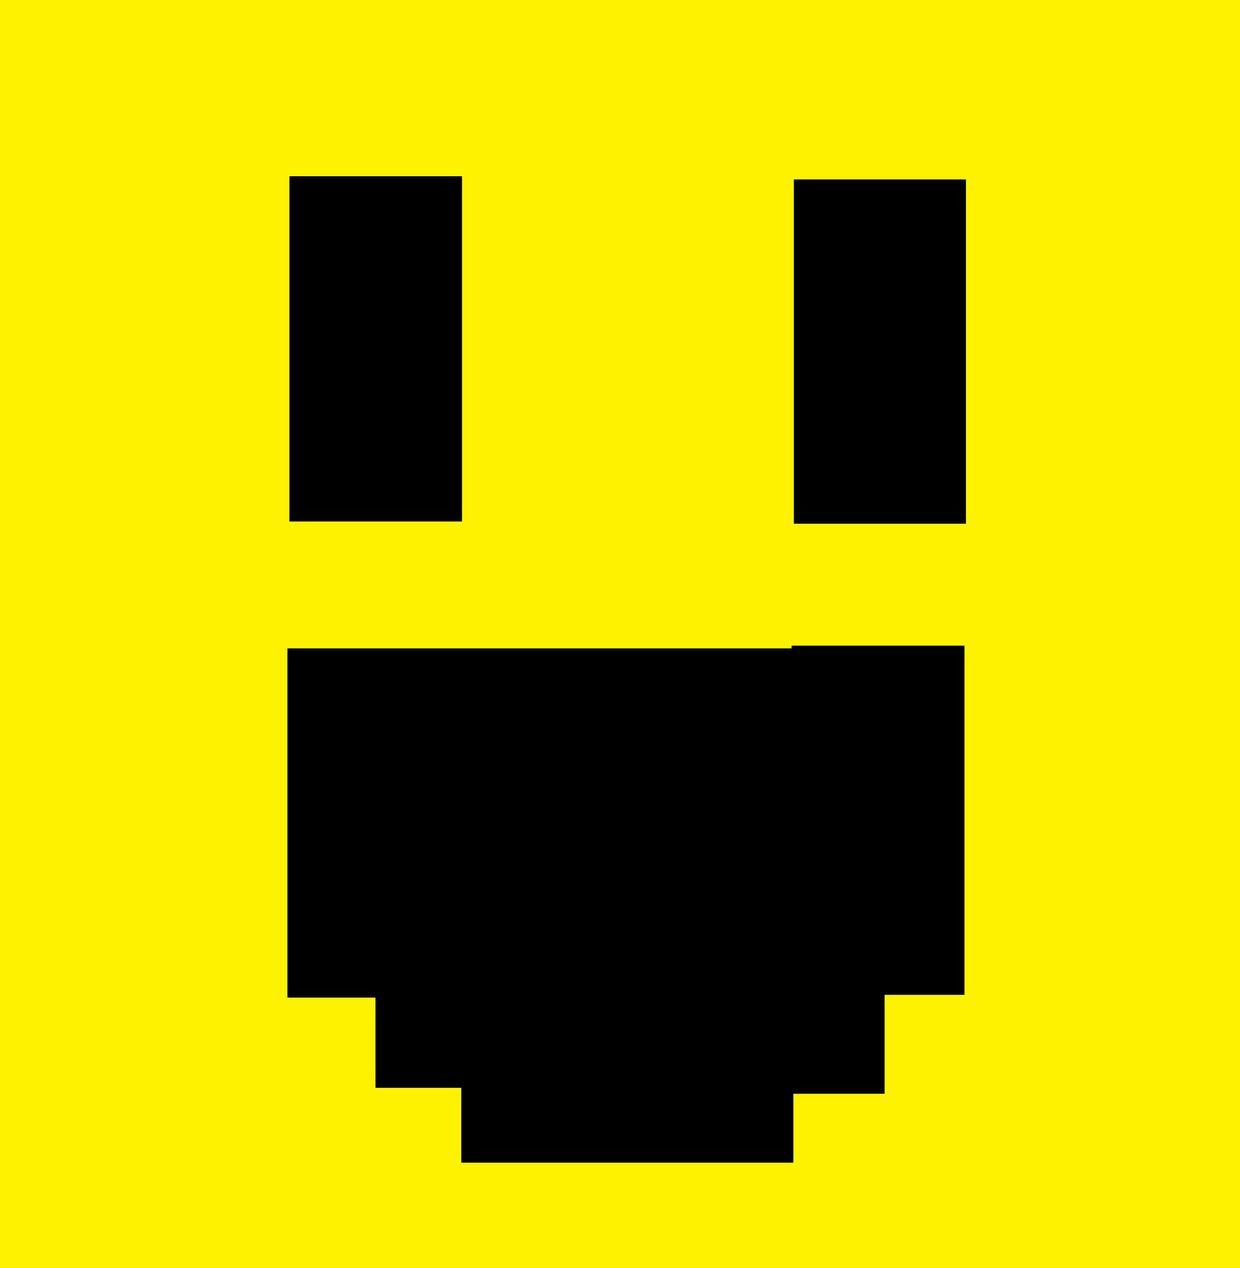 Emoji college